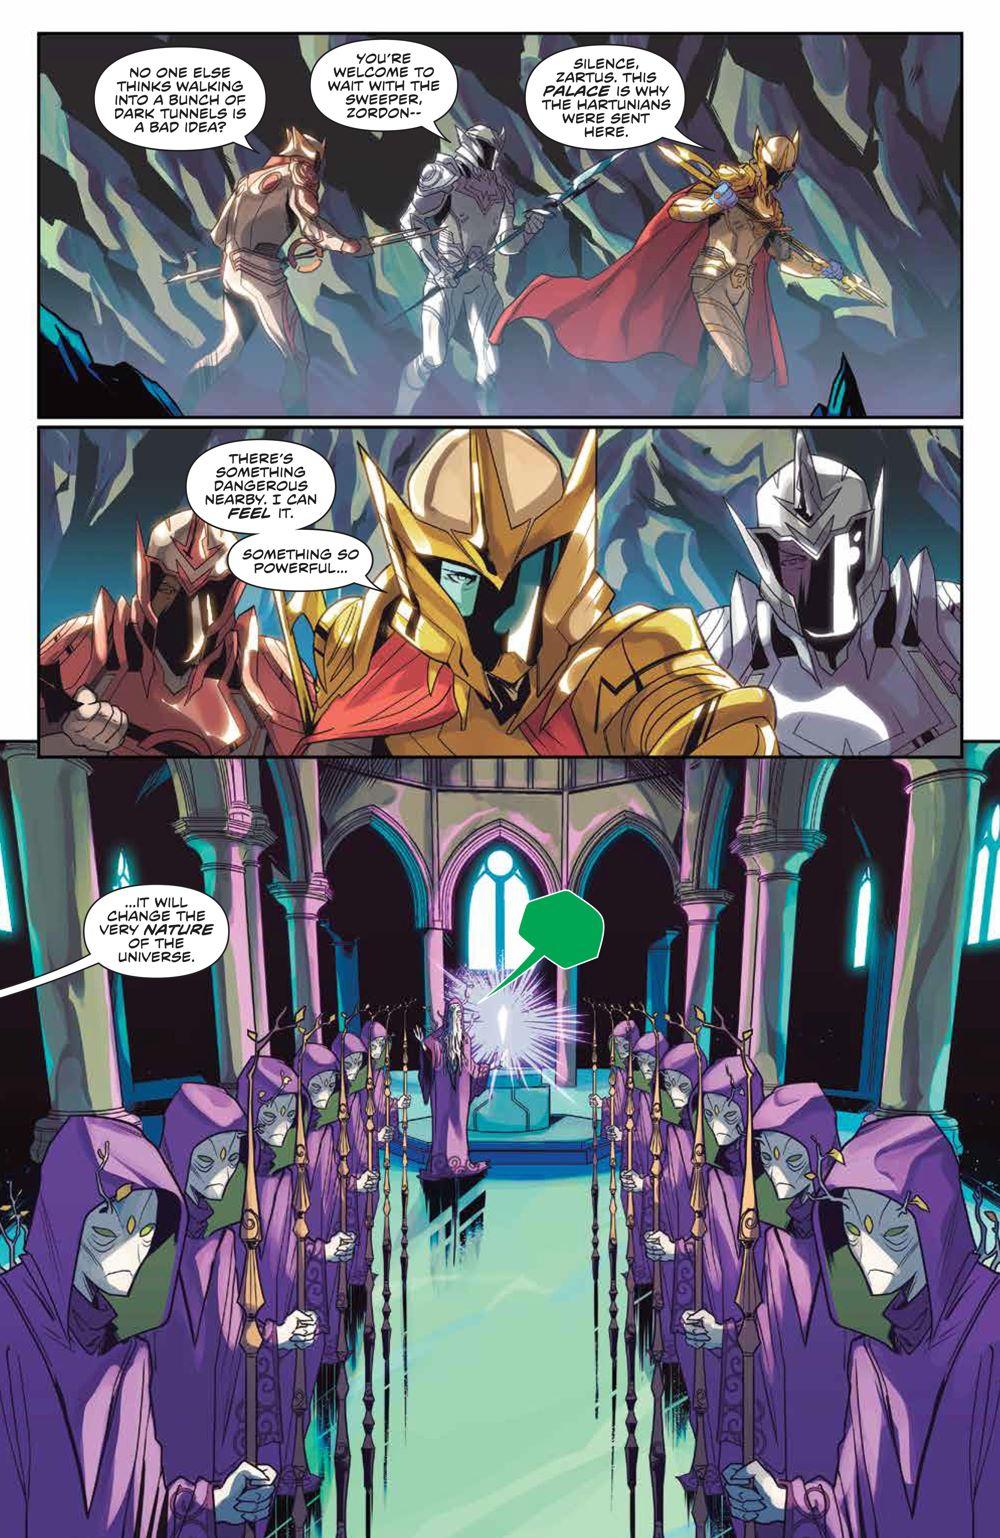 MightyMorphin_007_PRESS_4 ComicList Previews: MIGHTY MORPHIN #7